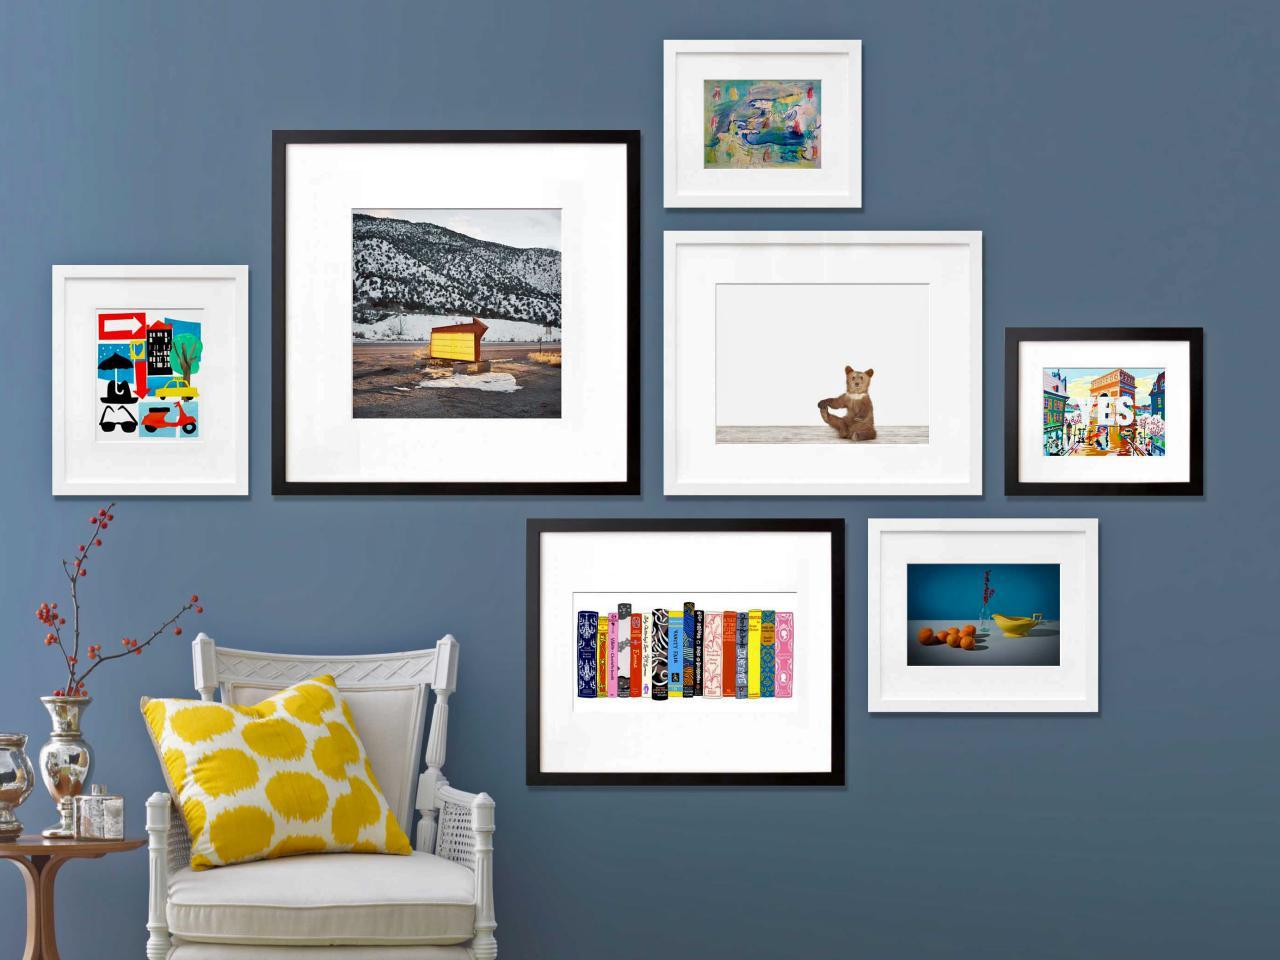 Original_Jeanine-Hays-Gallery-Wall-3-20x200-Blue-Wall-White-Frames_s4x3.jpg.rend.hgtvcom.1280.960